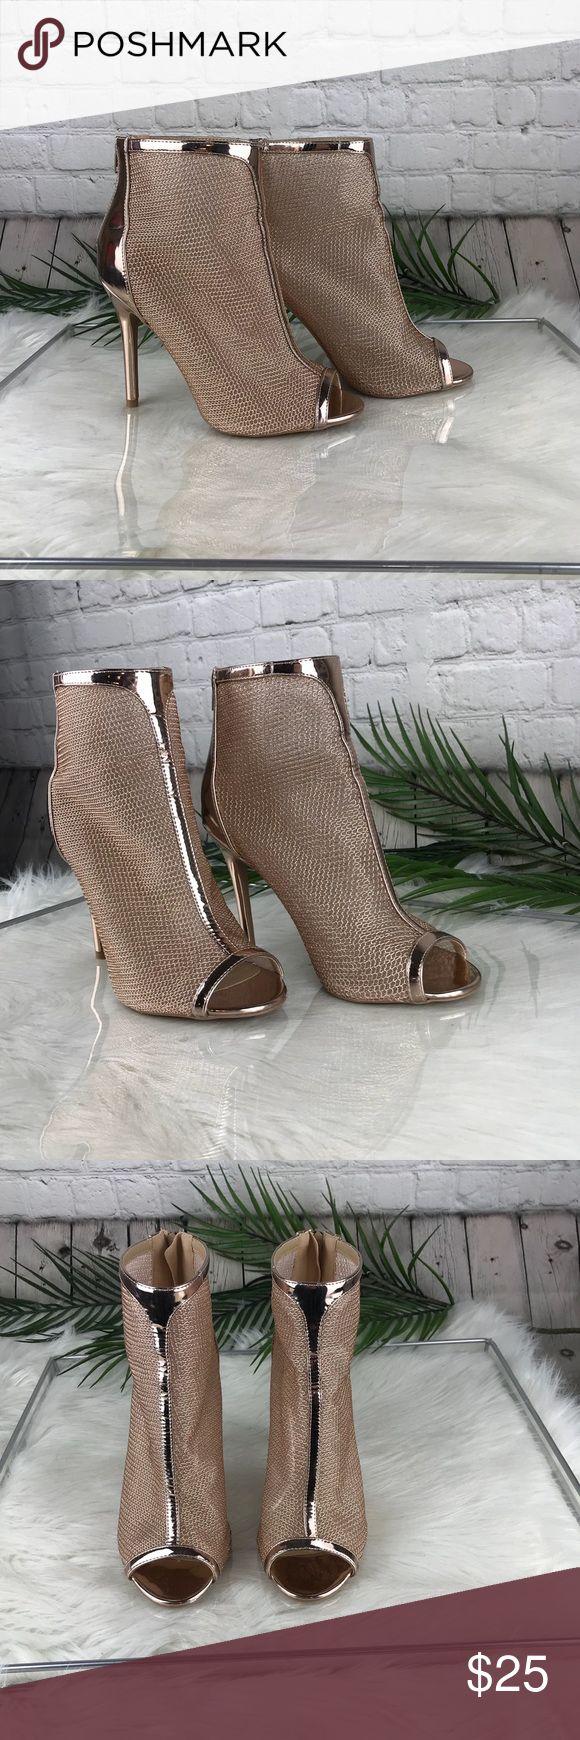 NWOT Champagne Colored Heels Super cute NWOT champagne colored heels . In a size 8 in women's Charlotte Russe Shoes Heels